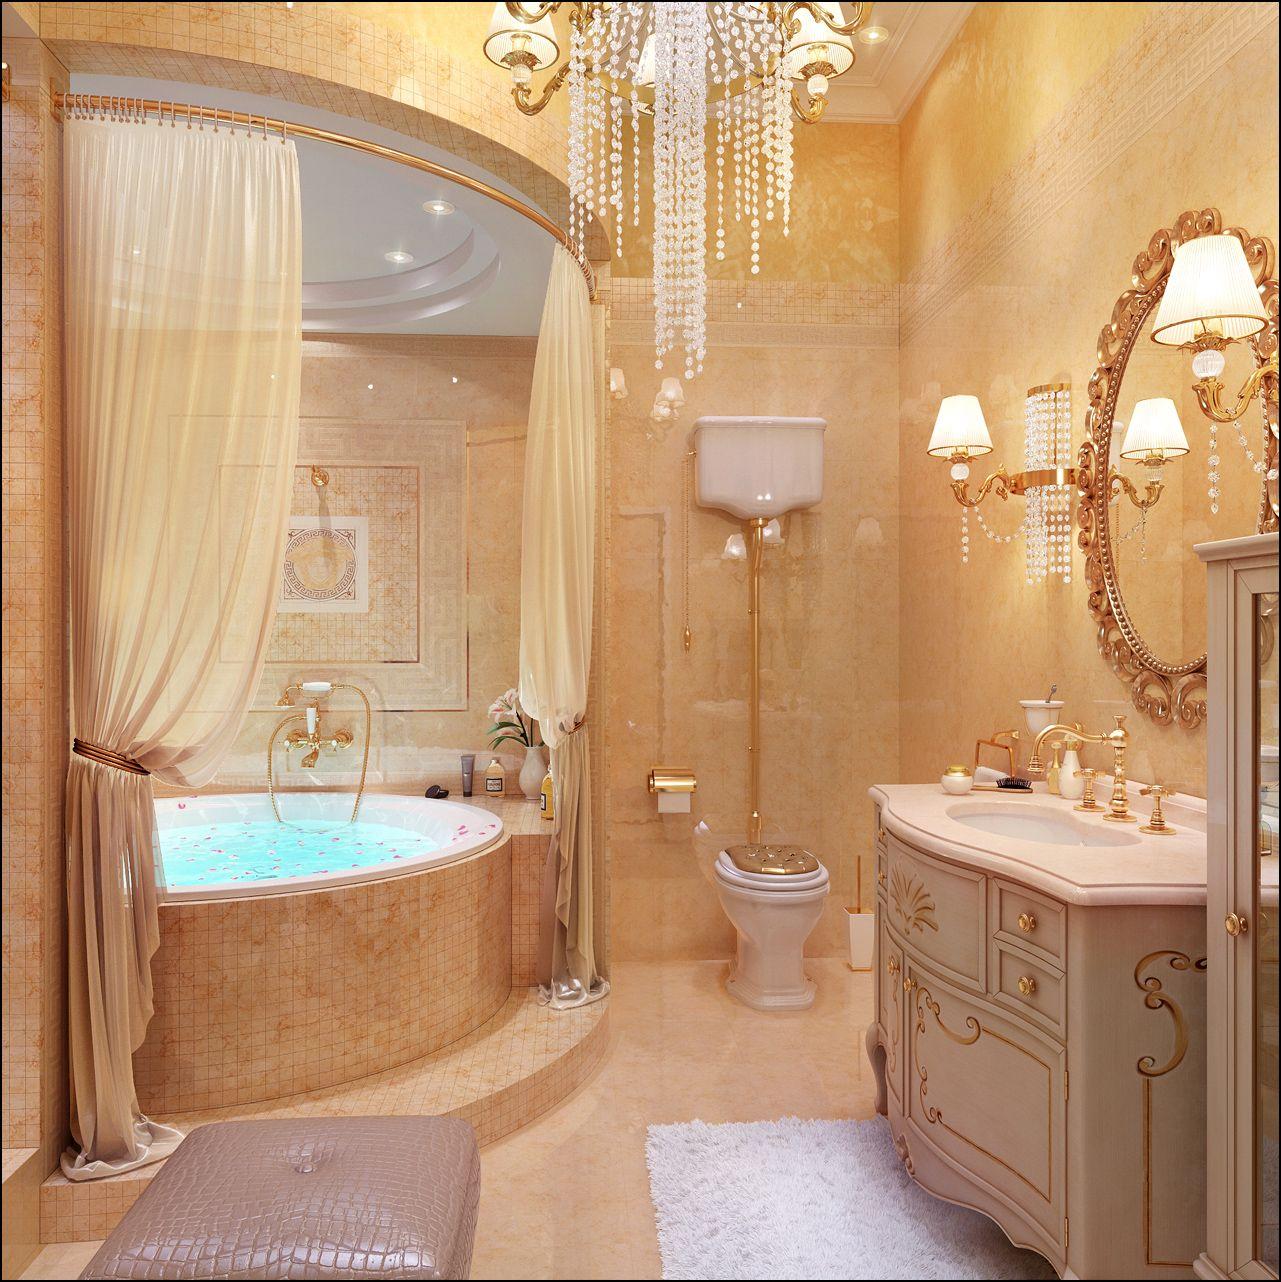 bath with jacuzi home sweet home pinterest luxuri ses badezimmer badezimmer und neuer. Black Bedroom Furniture Sets. Home Design Ideas